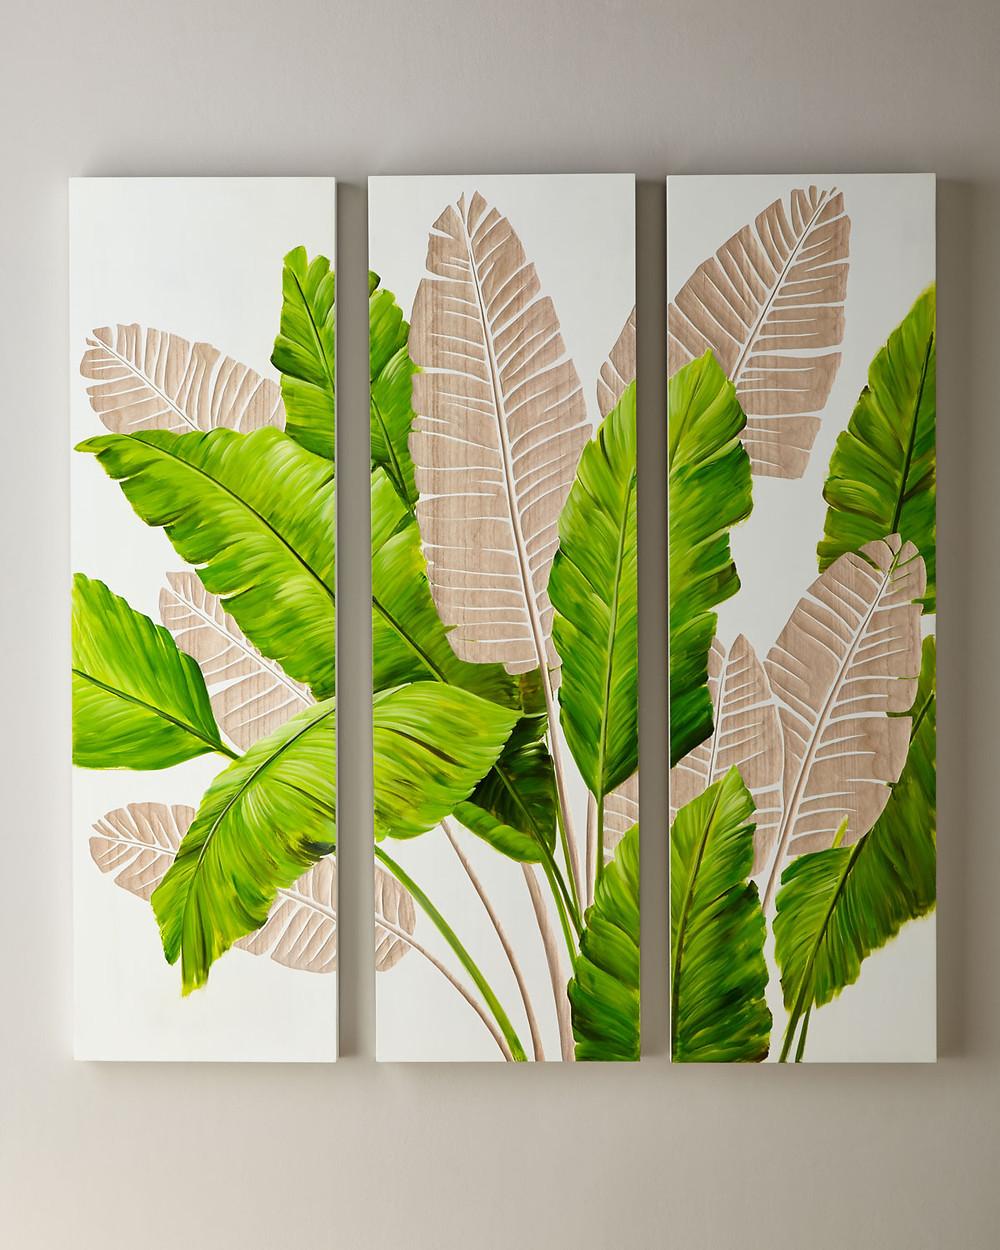 Legends Of Asia Palm Leaf Carved Wall Art, Set of 3 $849